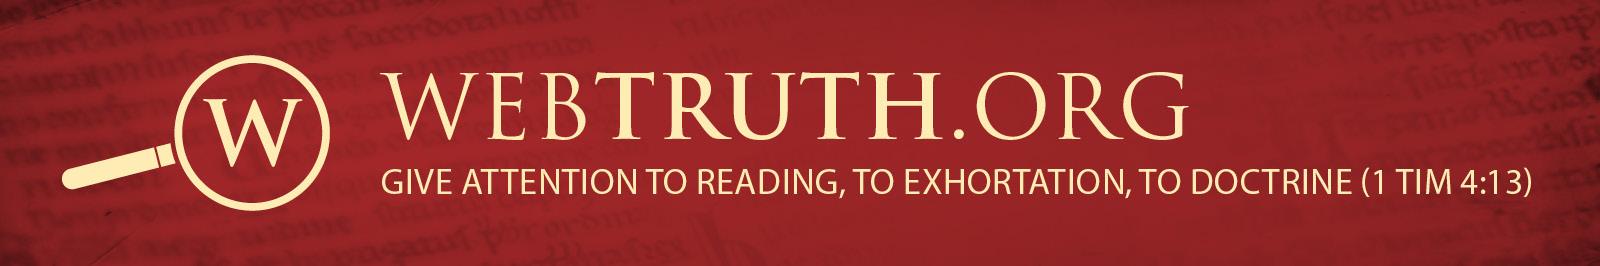 WebTruth.org